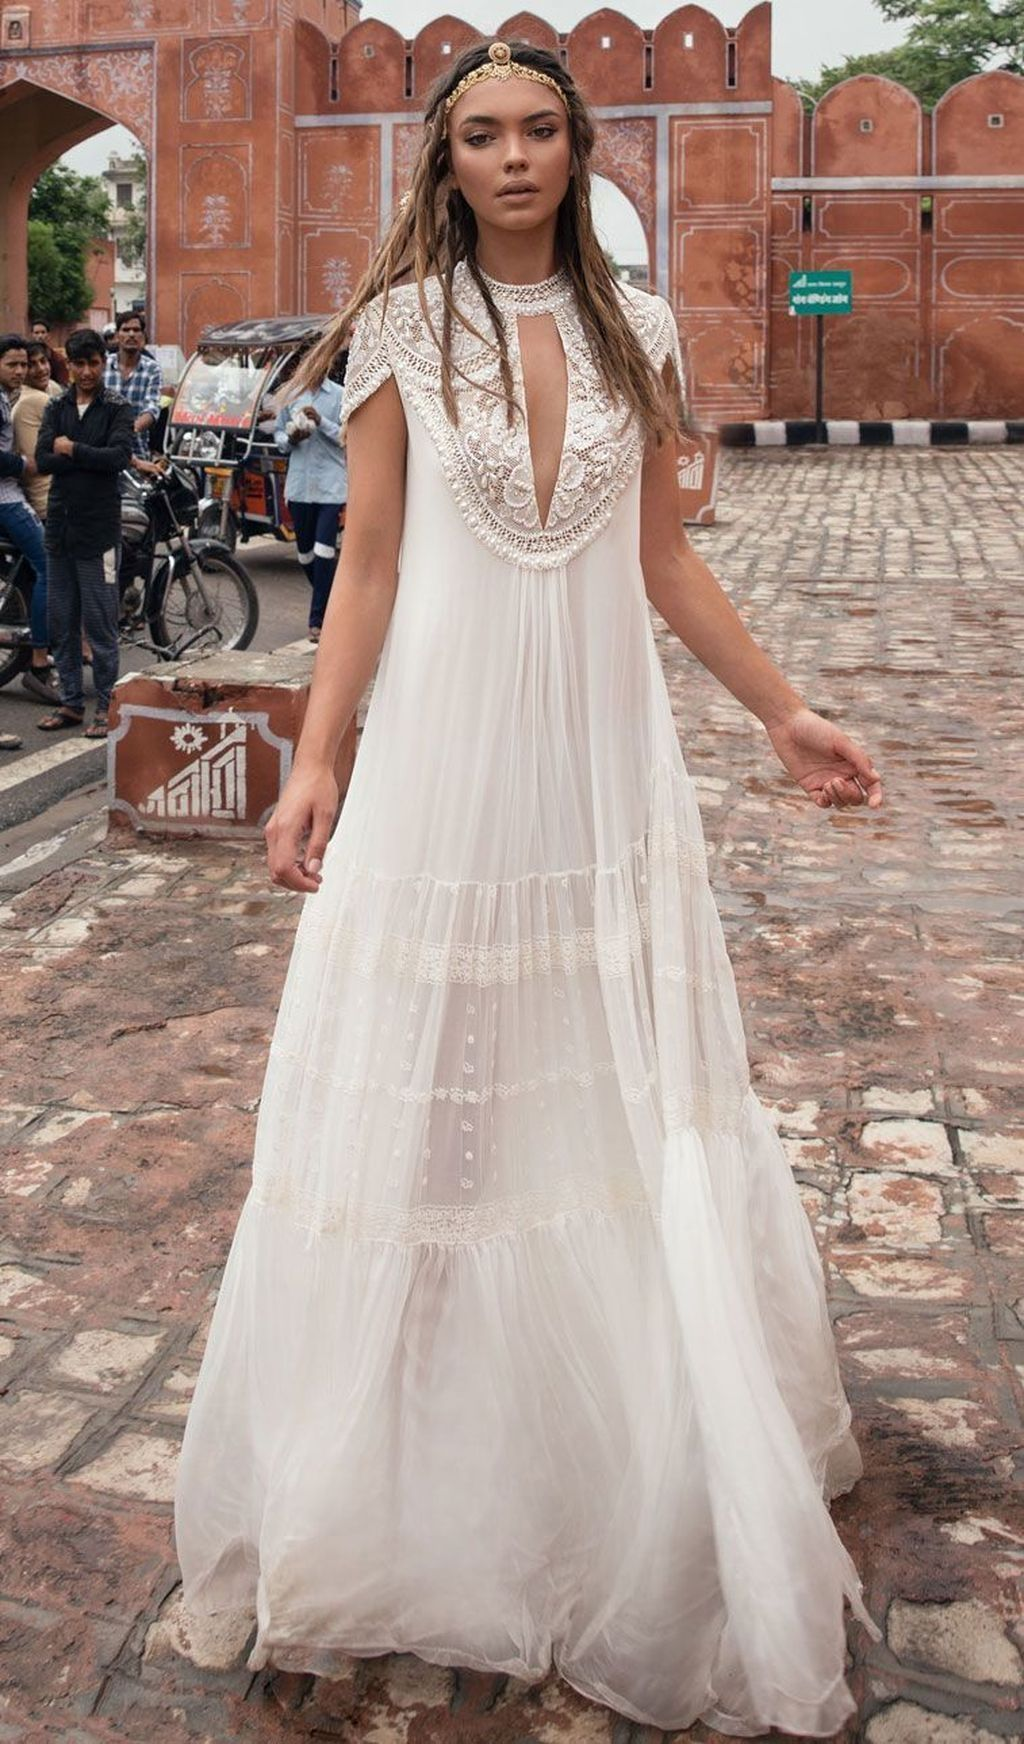 20+ Adorable Bohemian Wedding Dress Ideas To Makes You Look Stunning